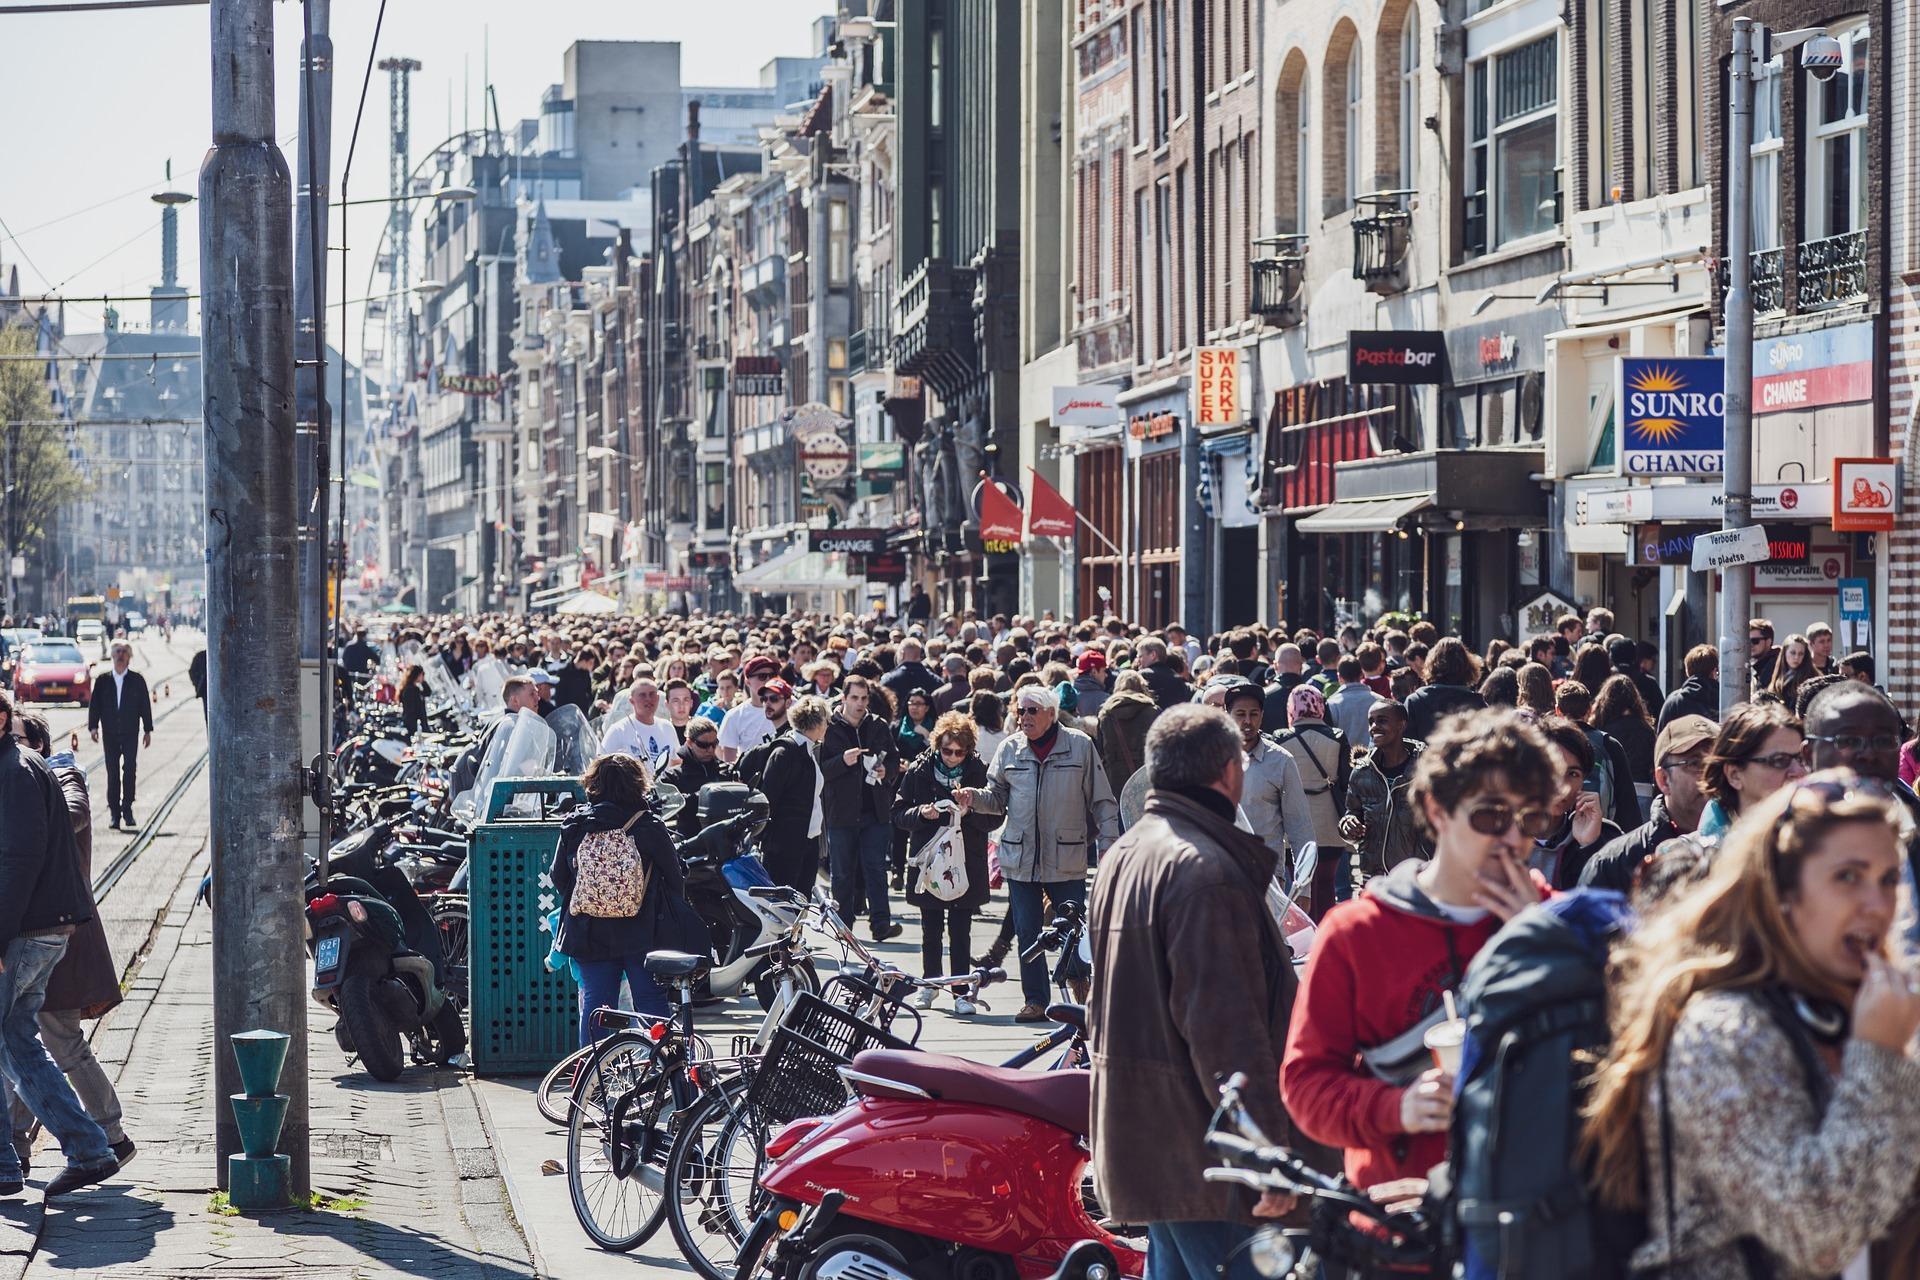 amsterdam crowd